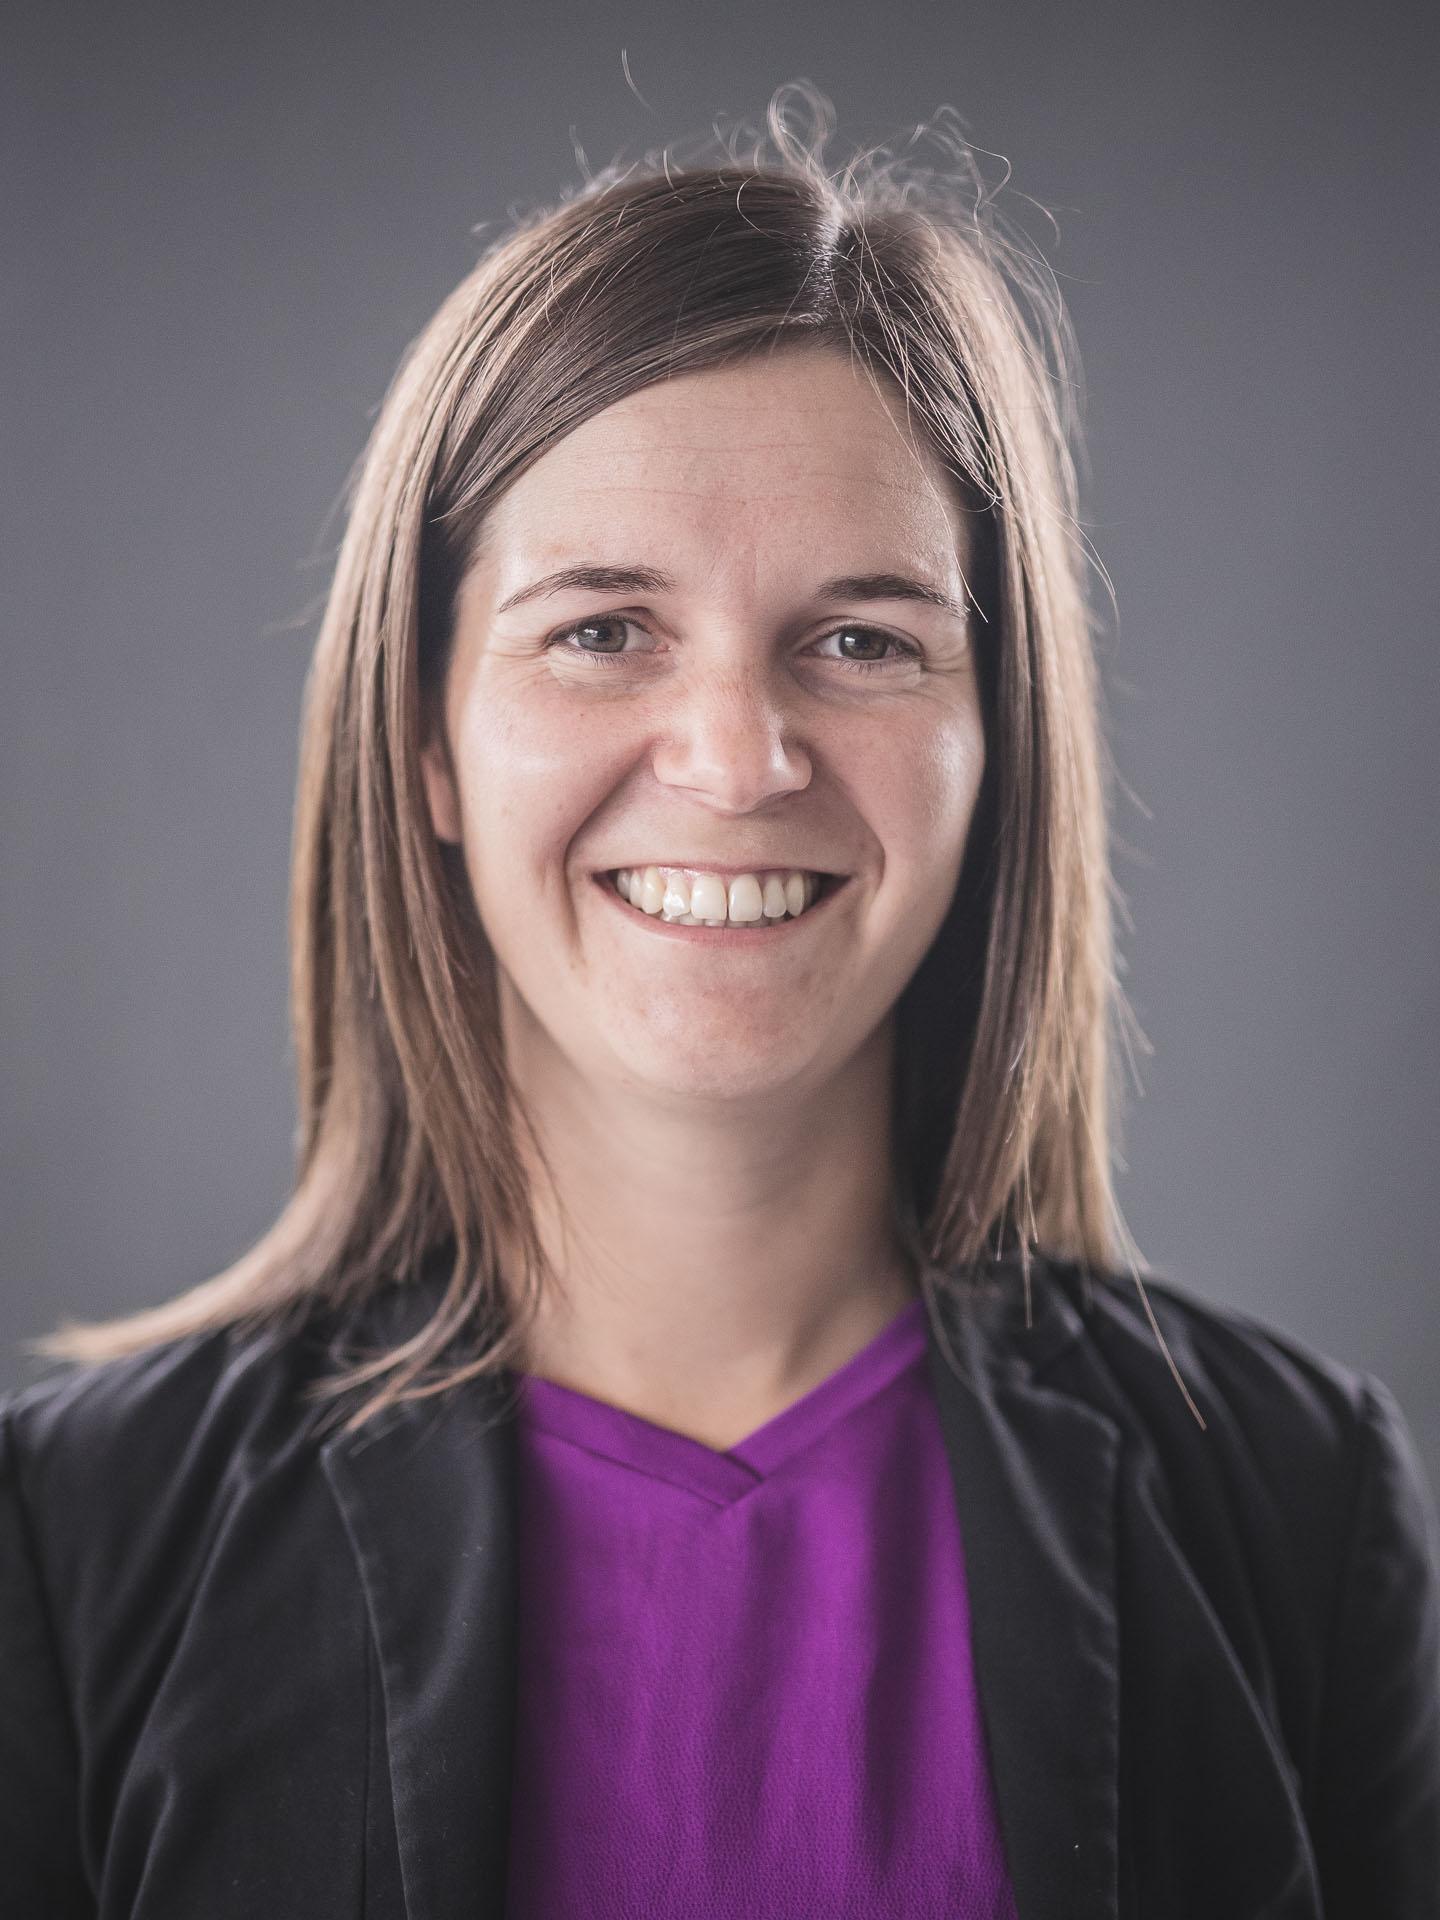 Magdalena Michaeler